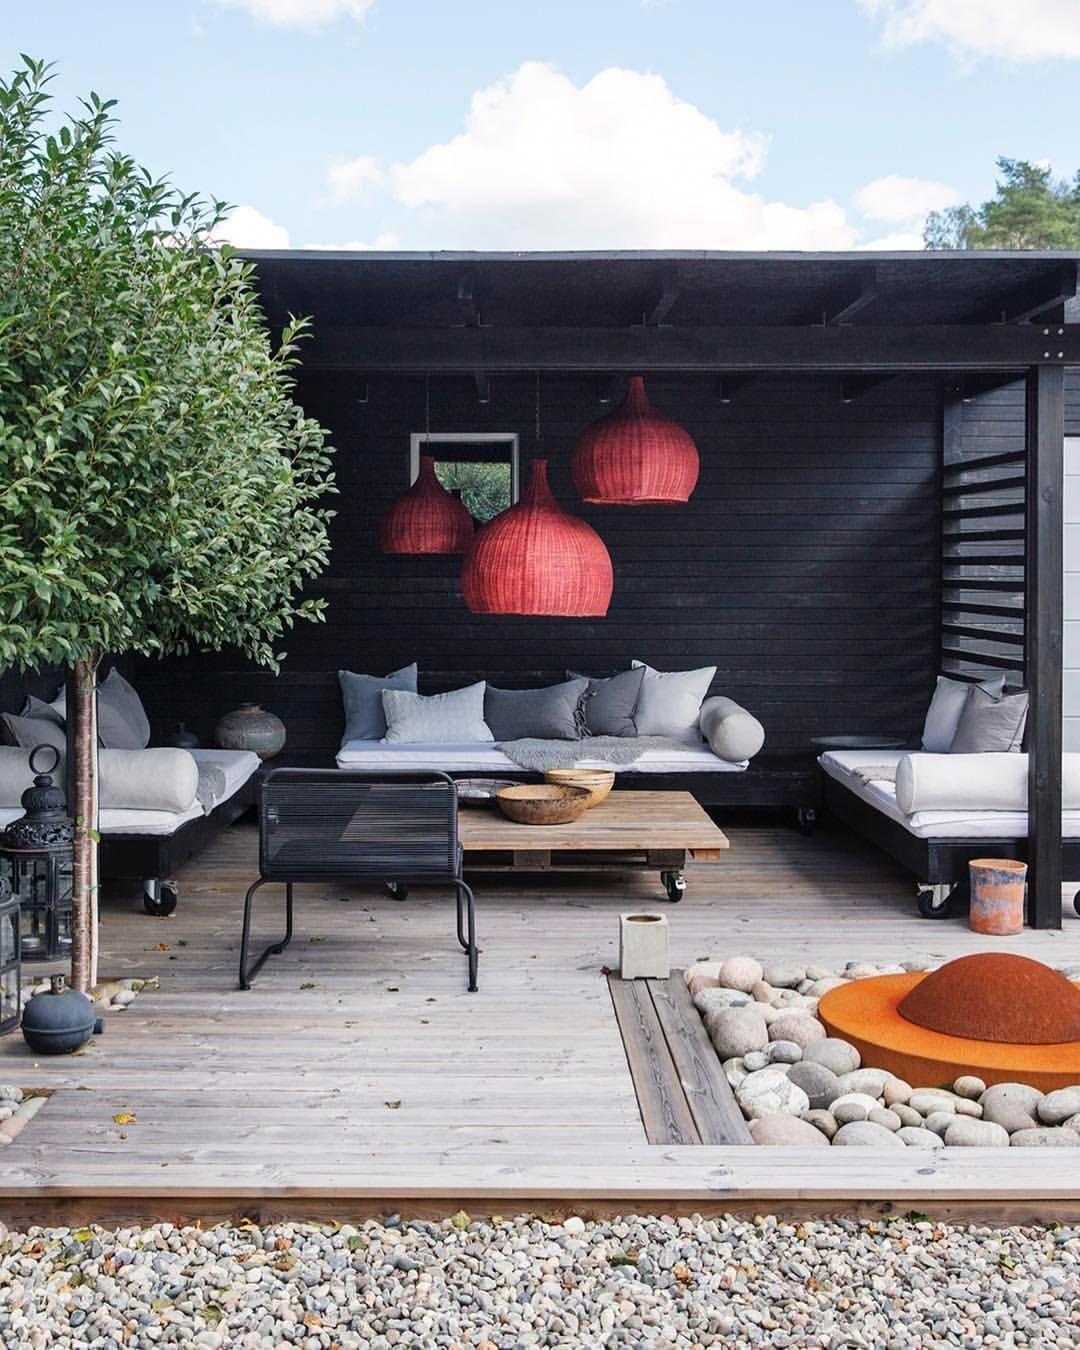 pergola minimum height pergolaroofbrackets refferal on backyard landscaping ideas with minimum budget id=25034